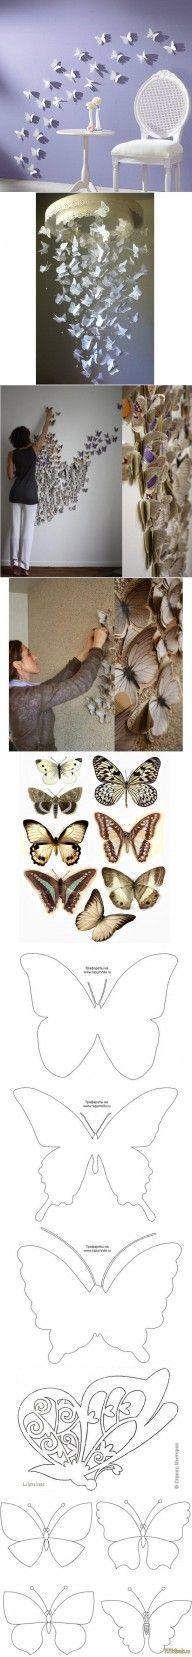 DIY Butterfly Pattern Wall Decor DIY Butterfly Pattern Wall Decor by diyforever Diy Butterfly, Butterfly Shape, Butterfly Pattern, Butterfly Mobile, Butterfly Template, Butterfly Design, Butterfly Outline, Butterfly Project, Crown Template